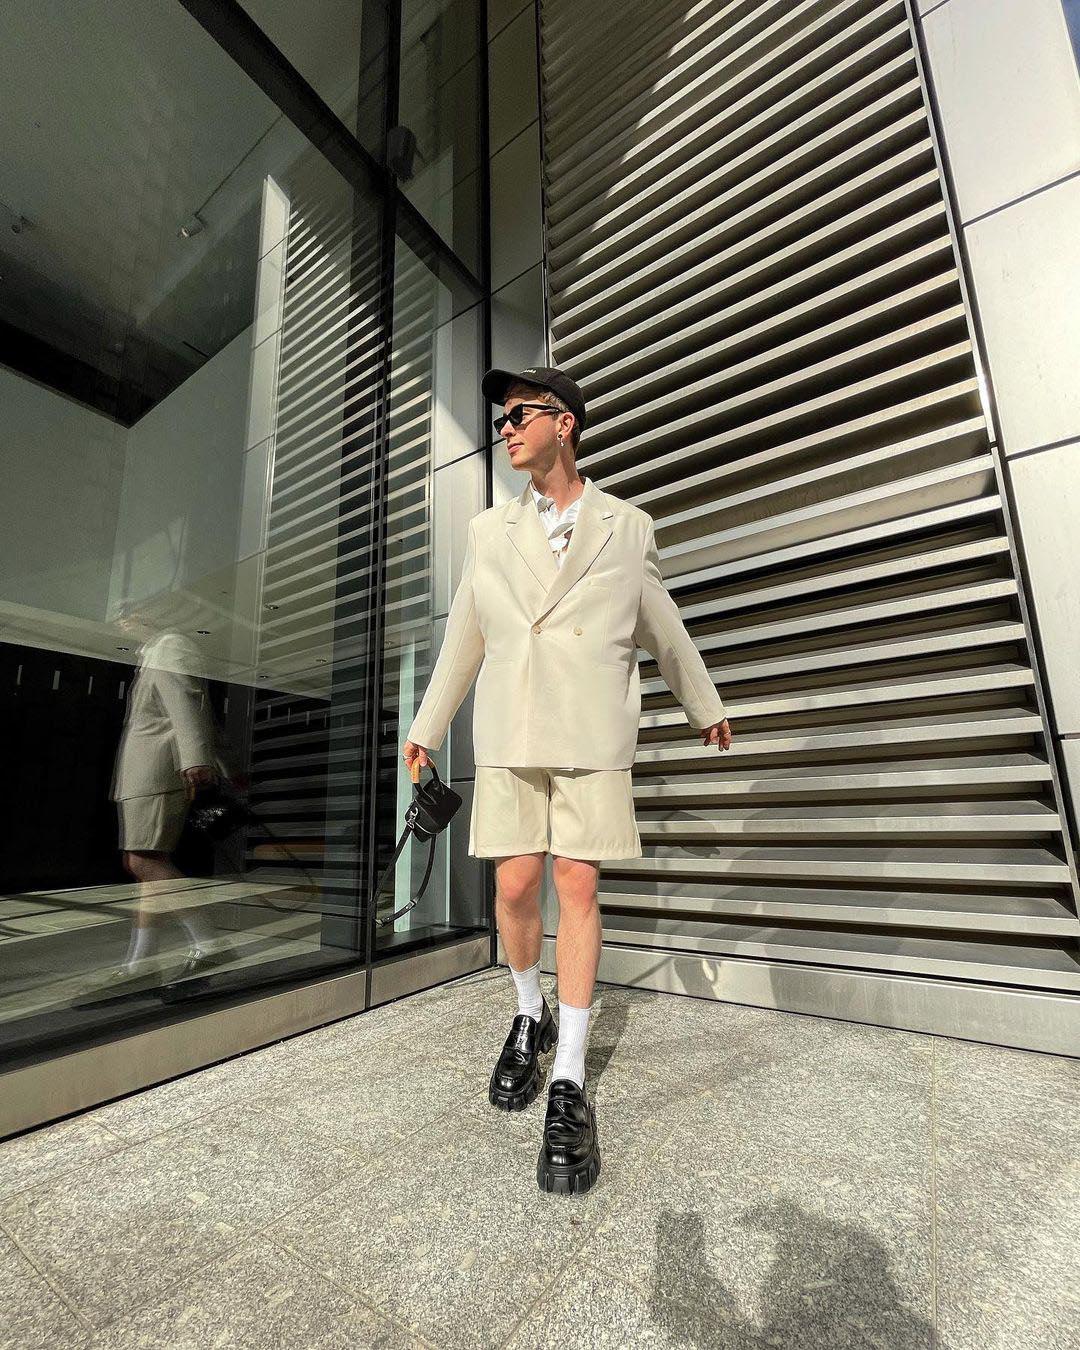 fashionisto gallucks